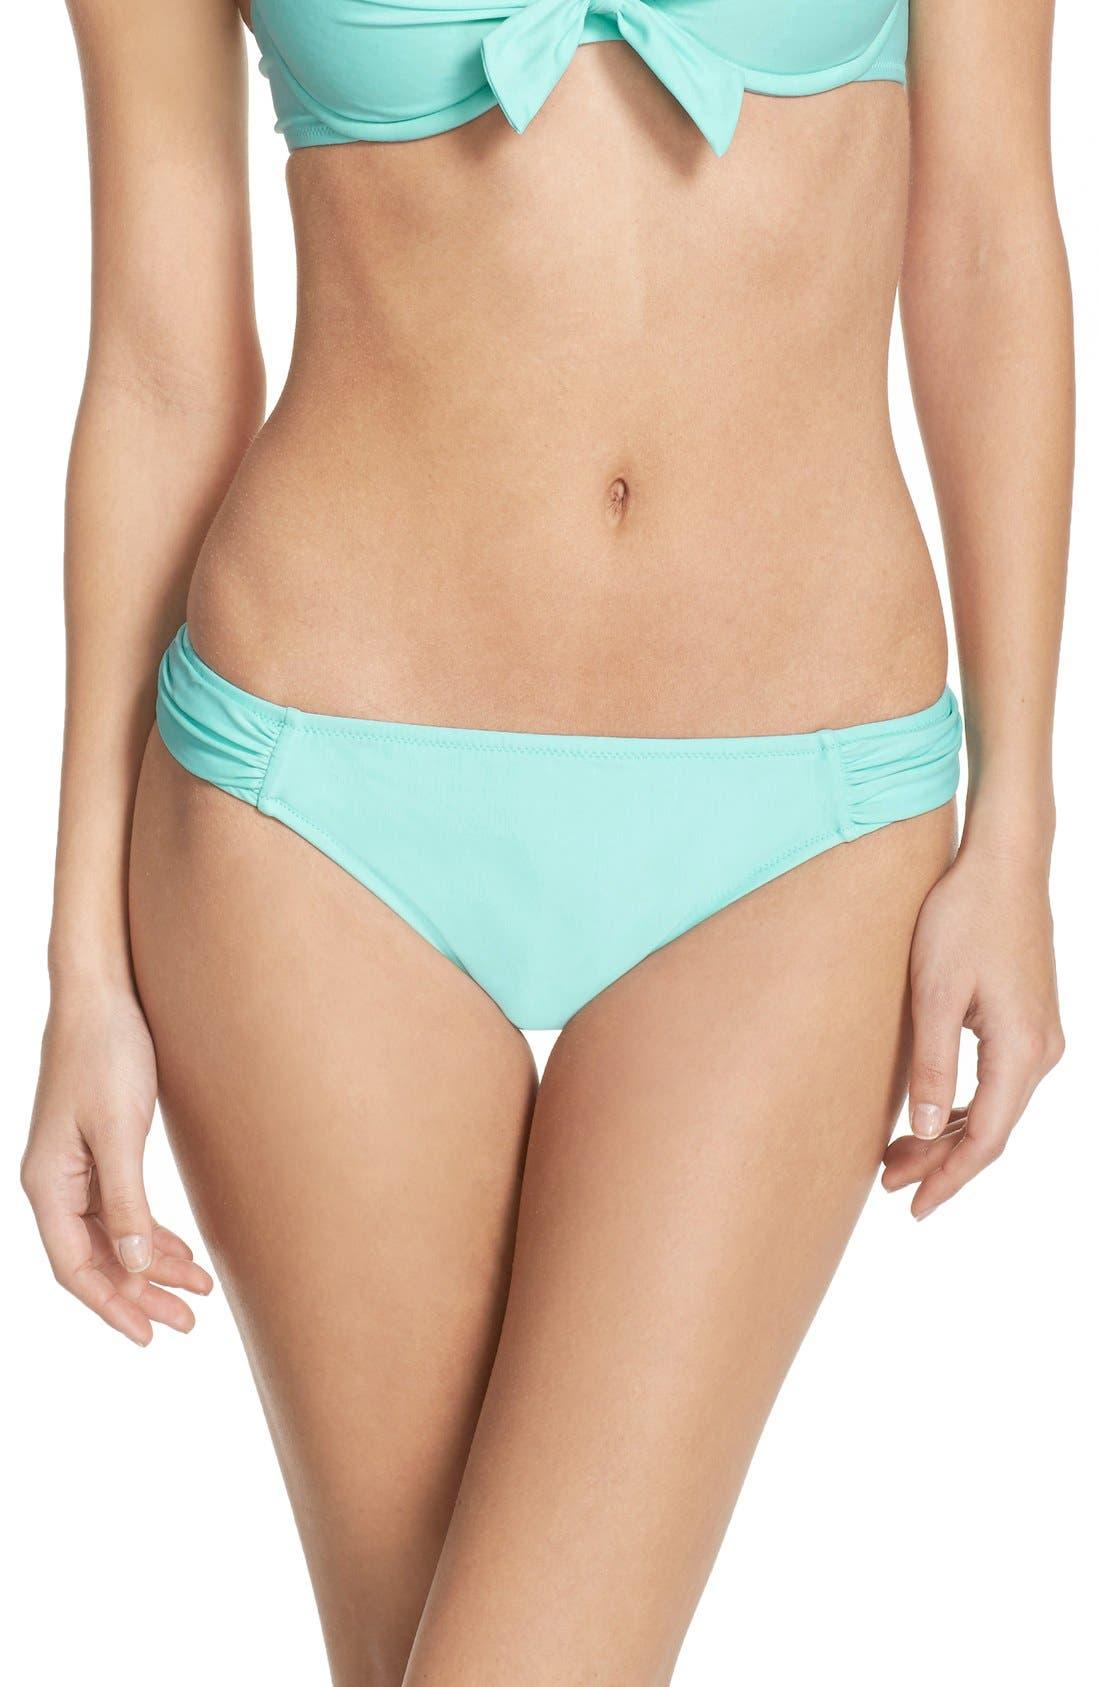 BLUSH BY PROFILE, Shirred Bikini Bottoms, Main thumbnail 1, color, 440